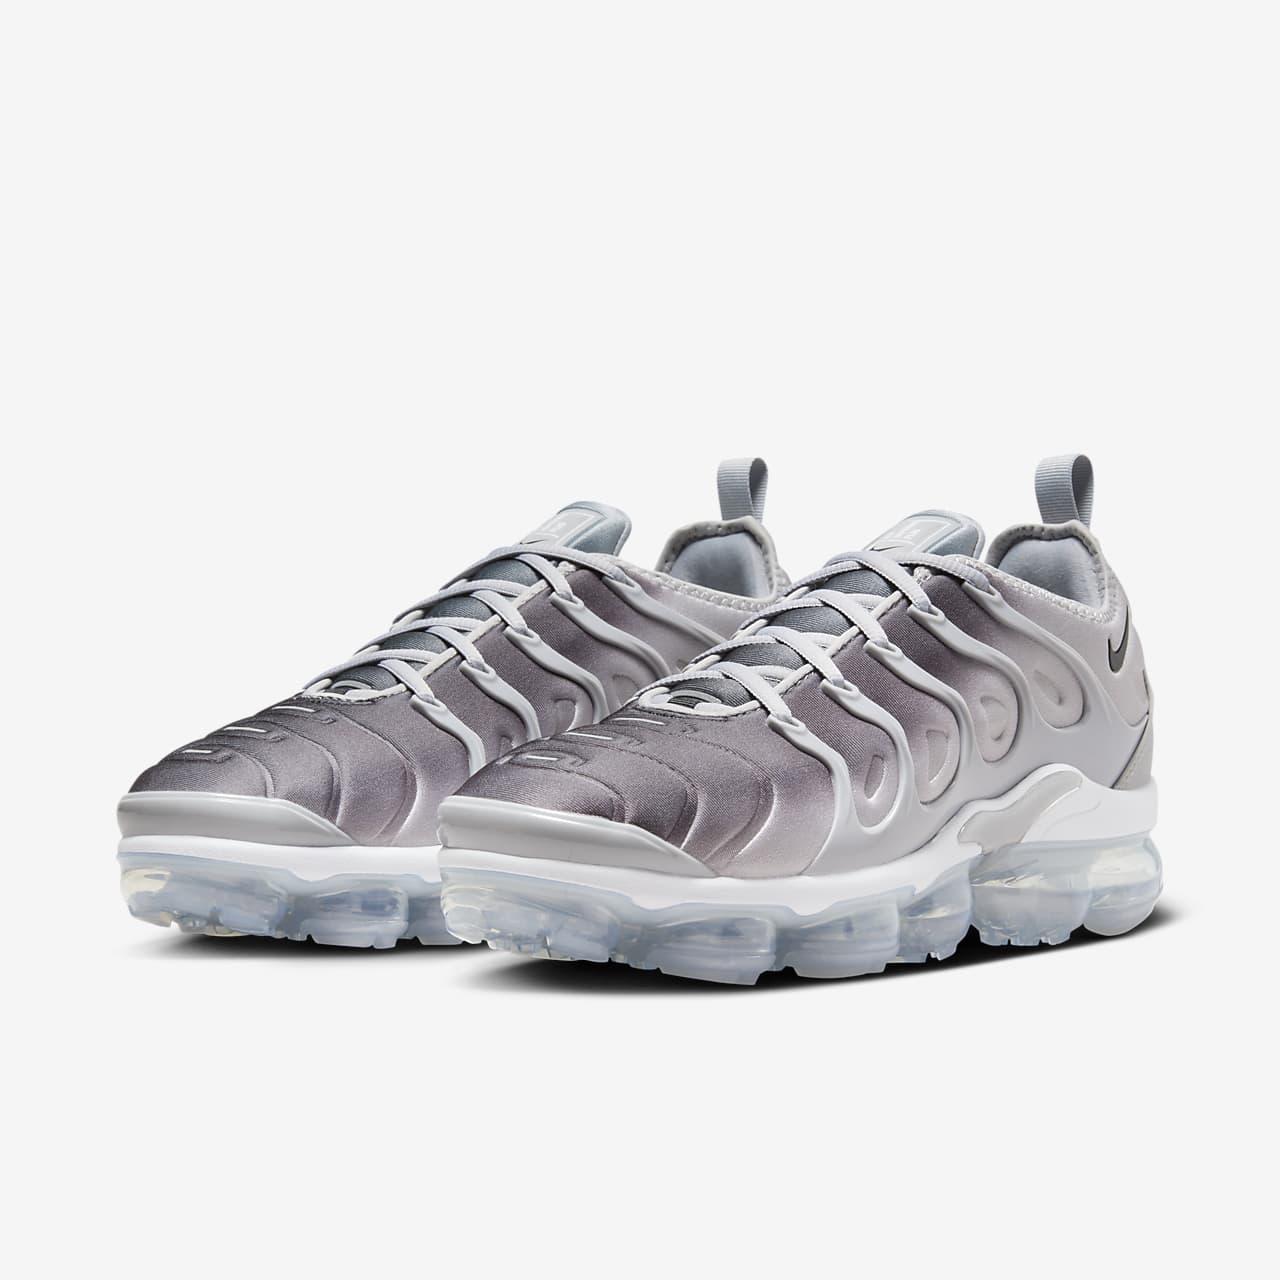 379c42f246d8c ... inexpensive nike air vapormax plus mens shoe eefc5 6e016